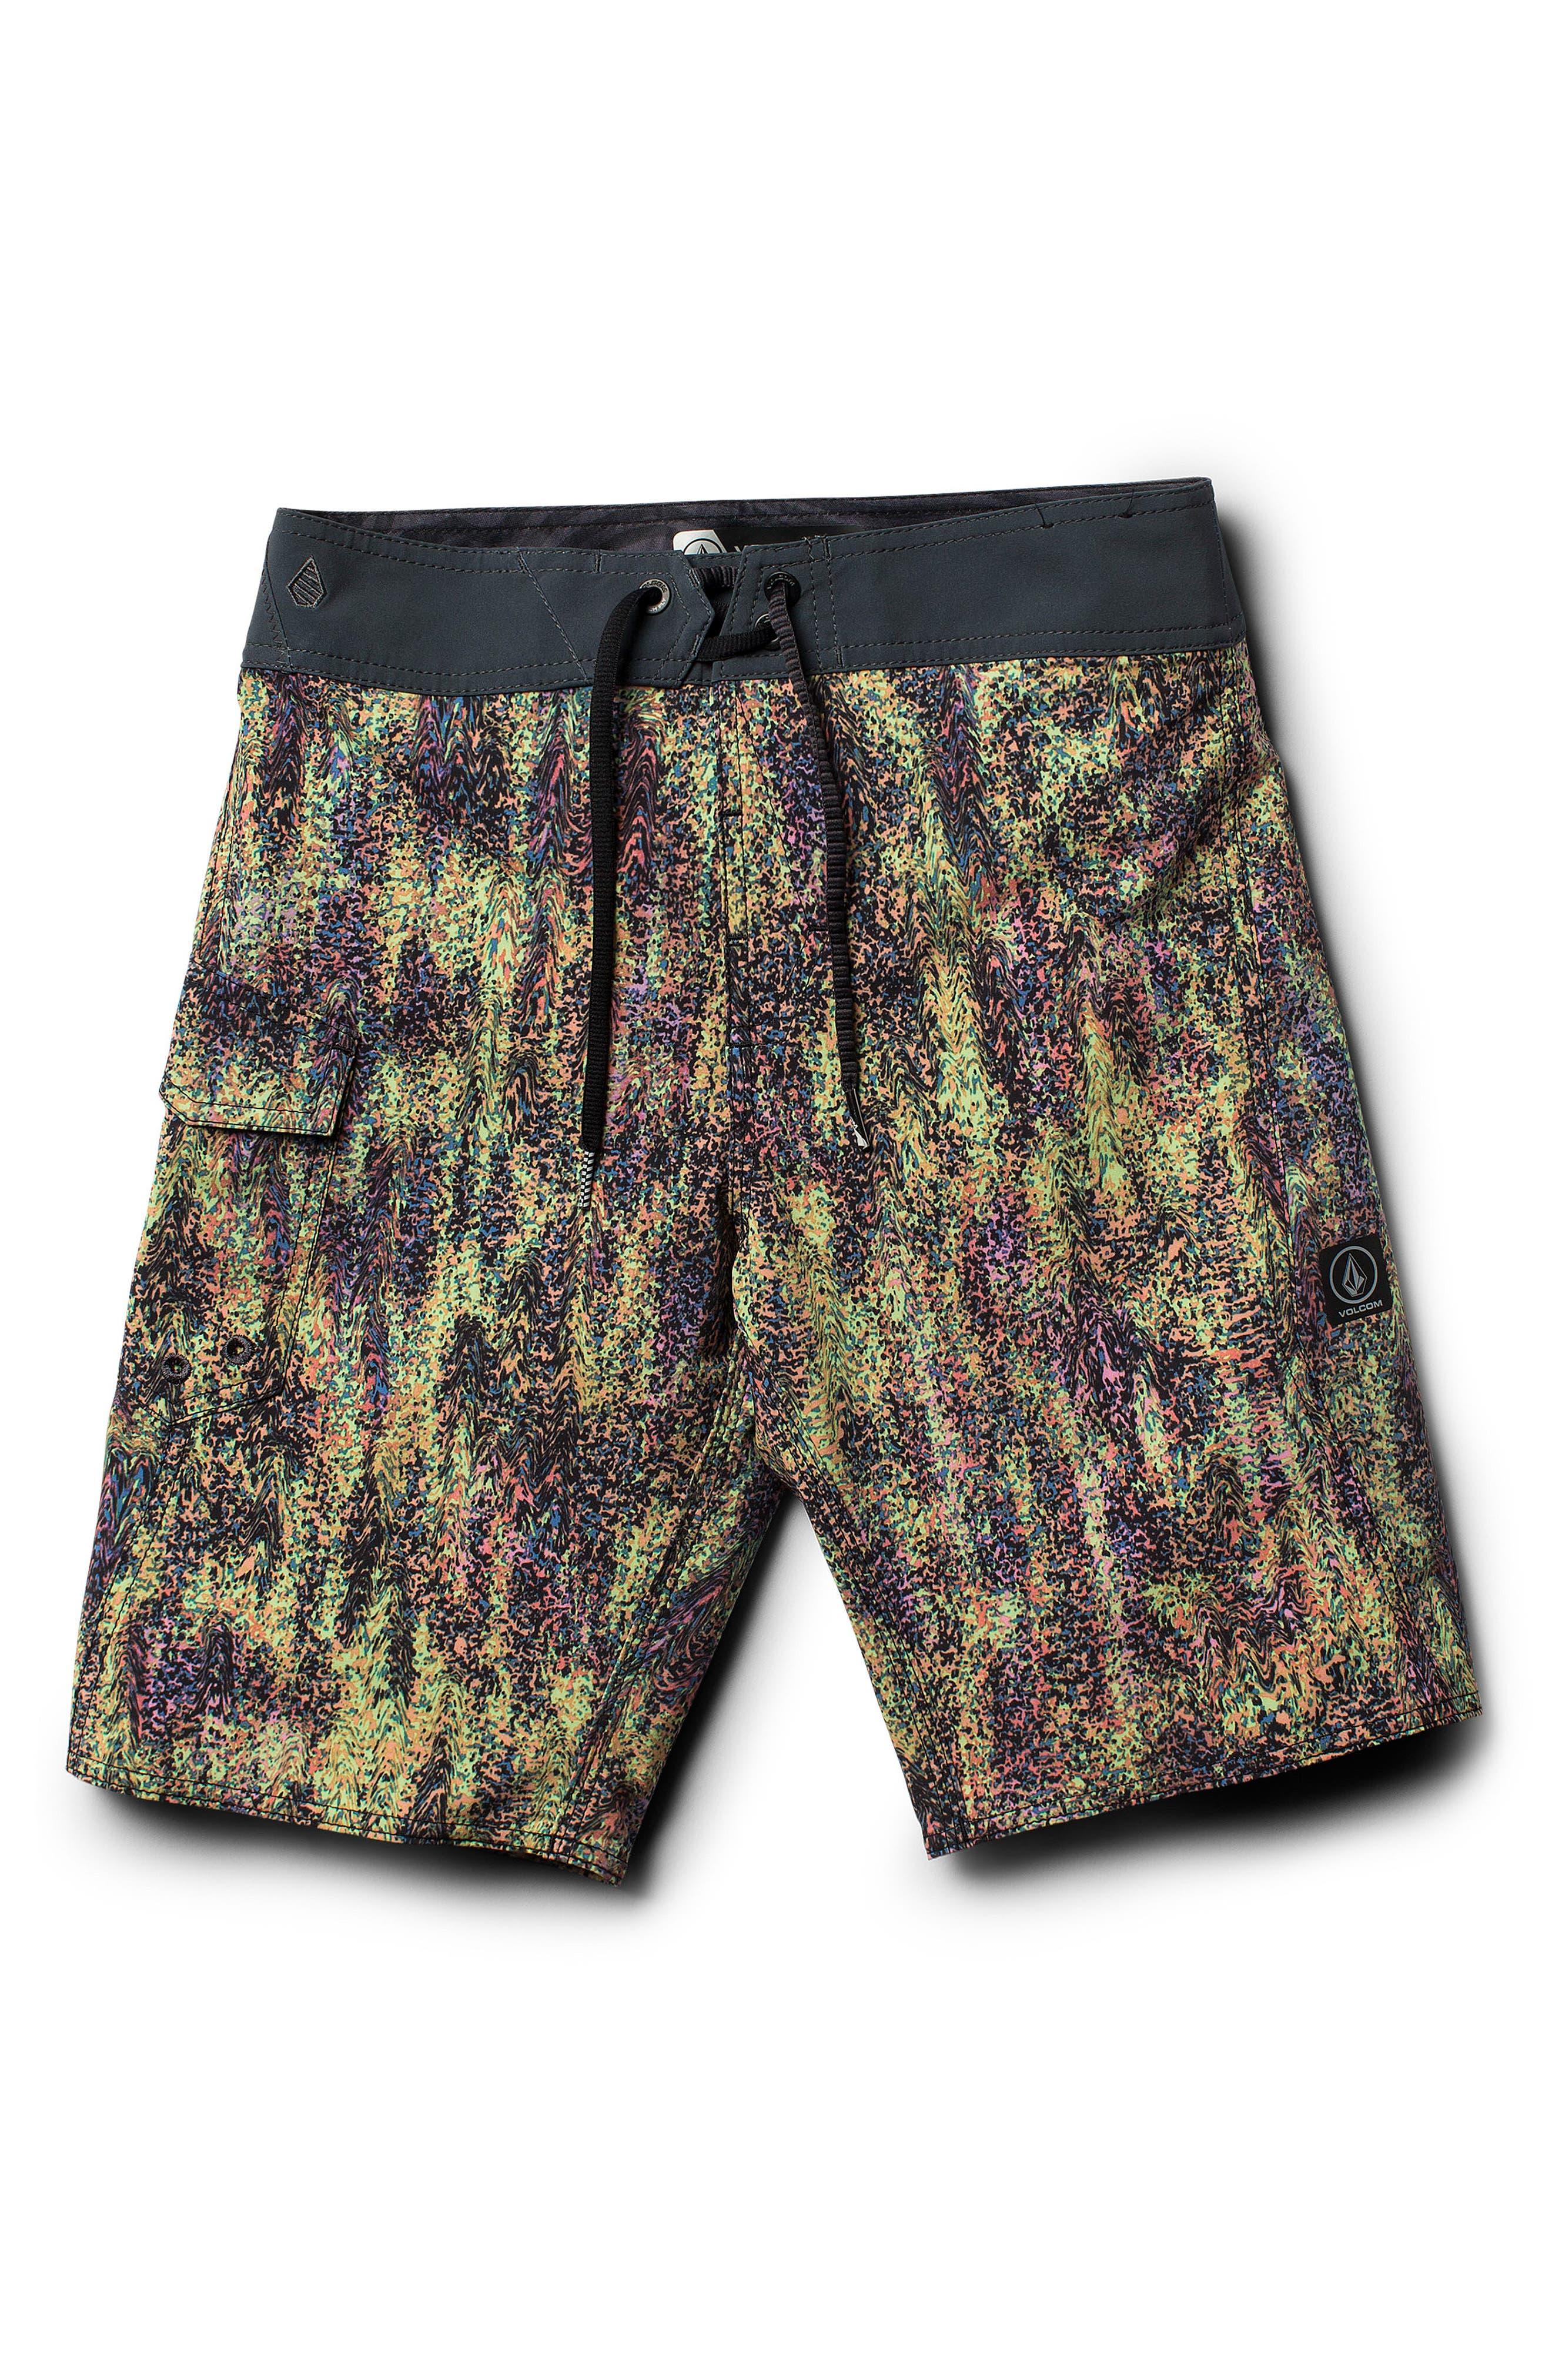 Plasm Mod Board Shorts,                             Main thumbnail 1, color,                             020